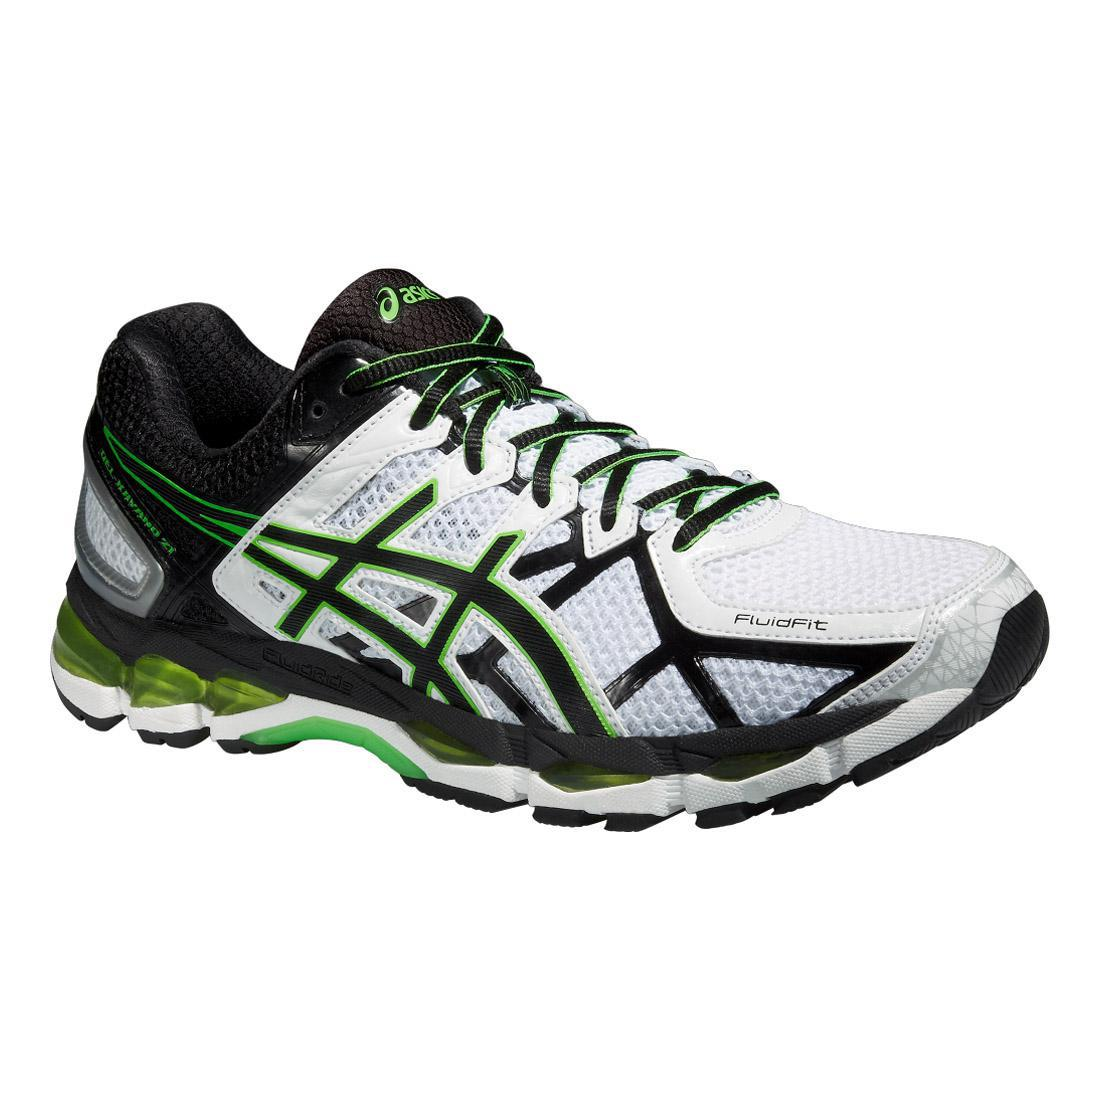 quality design 161a3 455a5 Asics Mens GEL-Kayano 21 Running Shoes - White Black - Tennisnuts.com